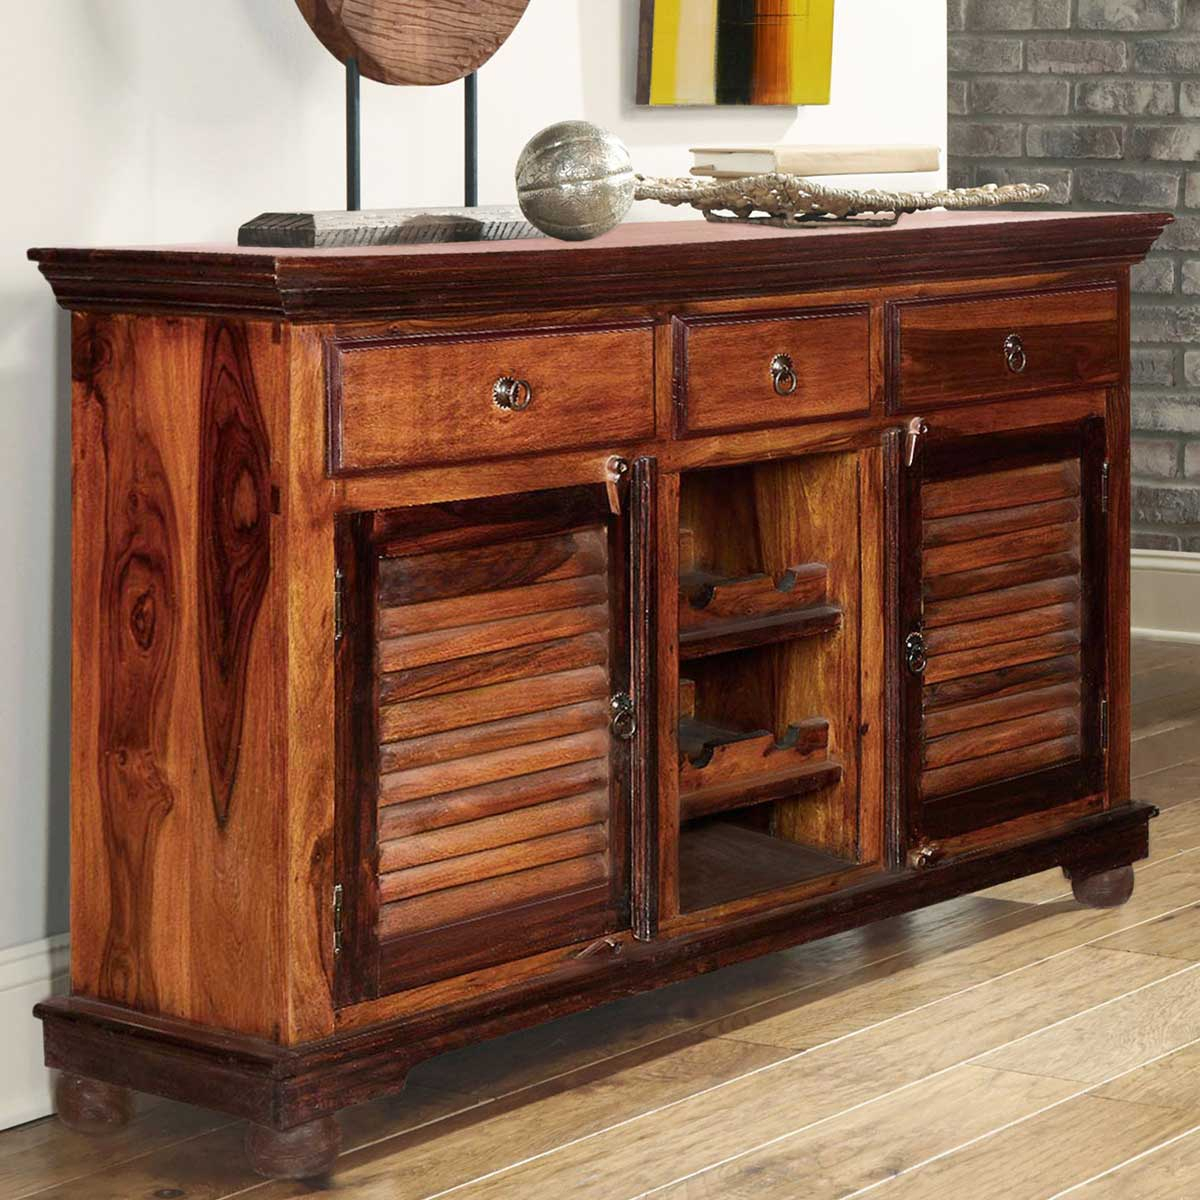 Shaker Rustic Solid Wood 3 Drawer Wine Bar Sideboard Cabinet regarding 3-Drawer Storage Buffets (Image 24 of 30)